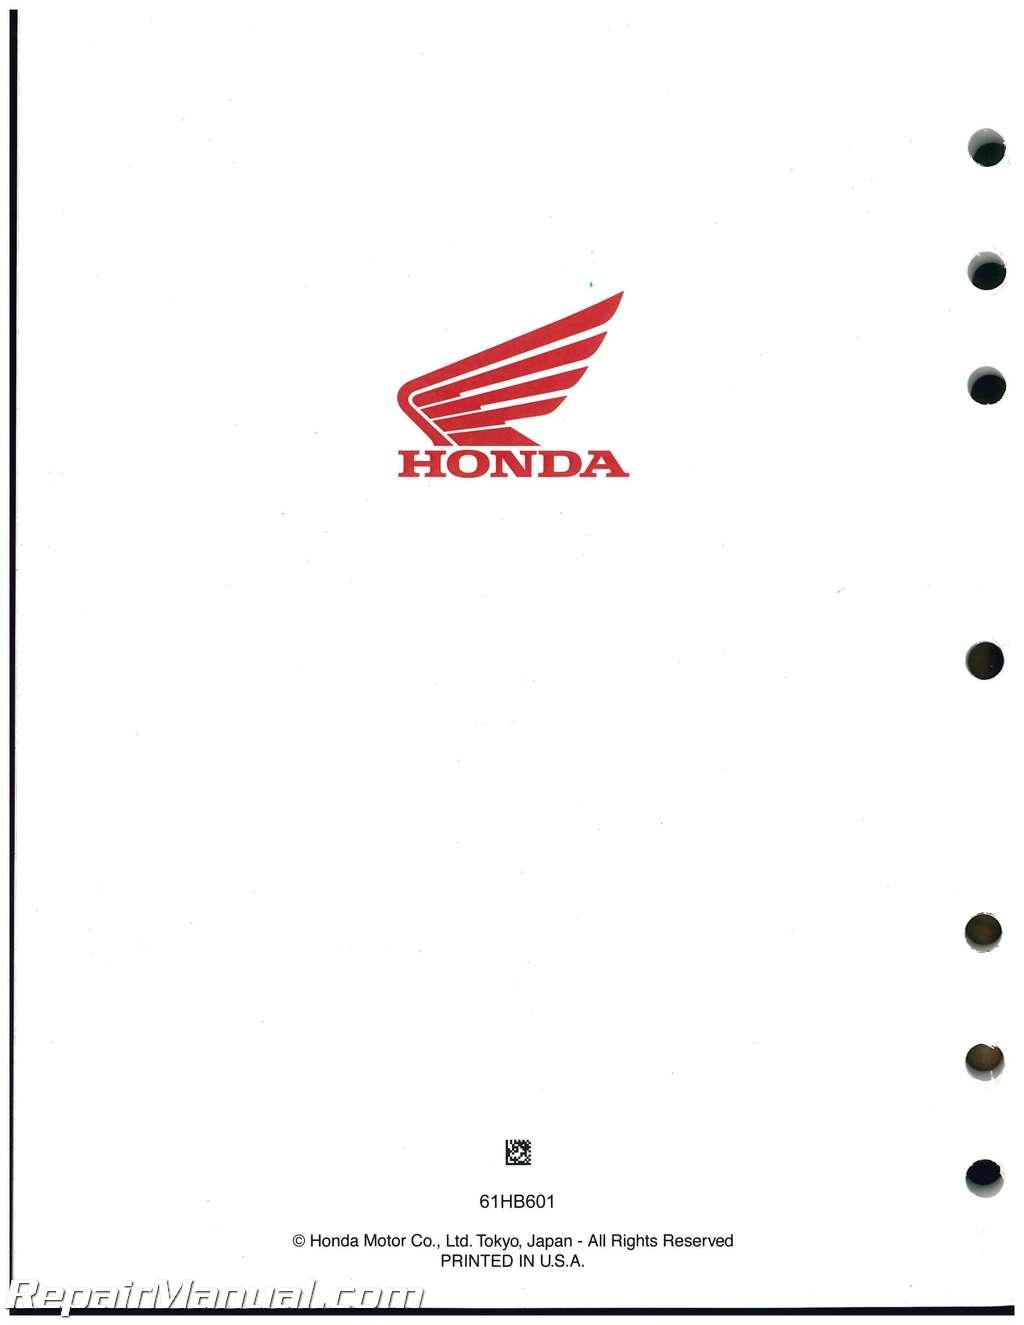 Honda 200 Three Wheeler Wiring Diagram furthermore Atc 70 Wiring Diagram as well Autoclutchexploded in addition Atc 200e Wiring Diagram furthermore 1985 Honda Trx 250 Wiring Diagram. on atc 125m wiring diagram